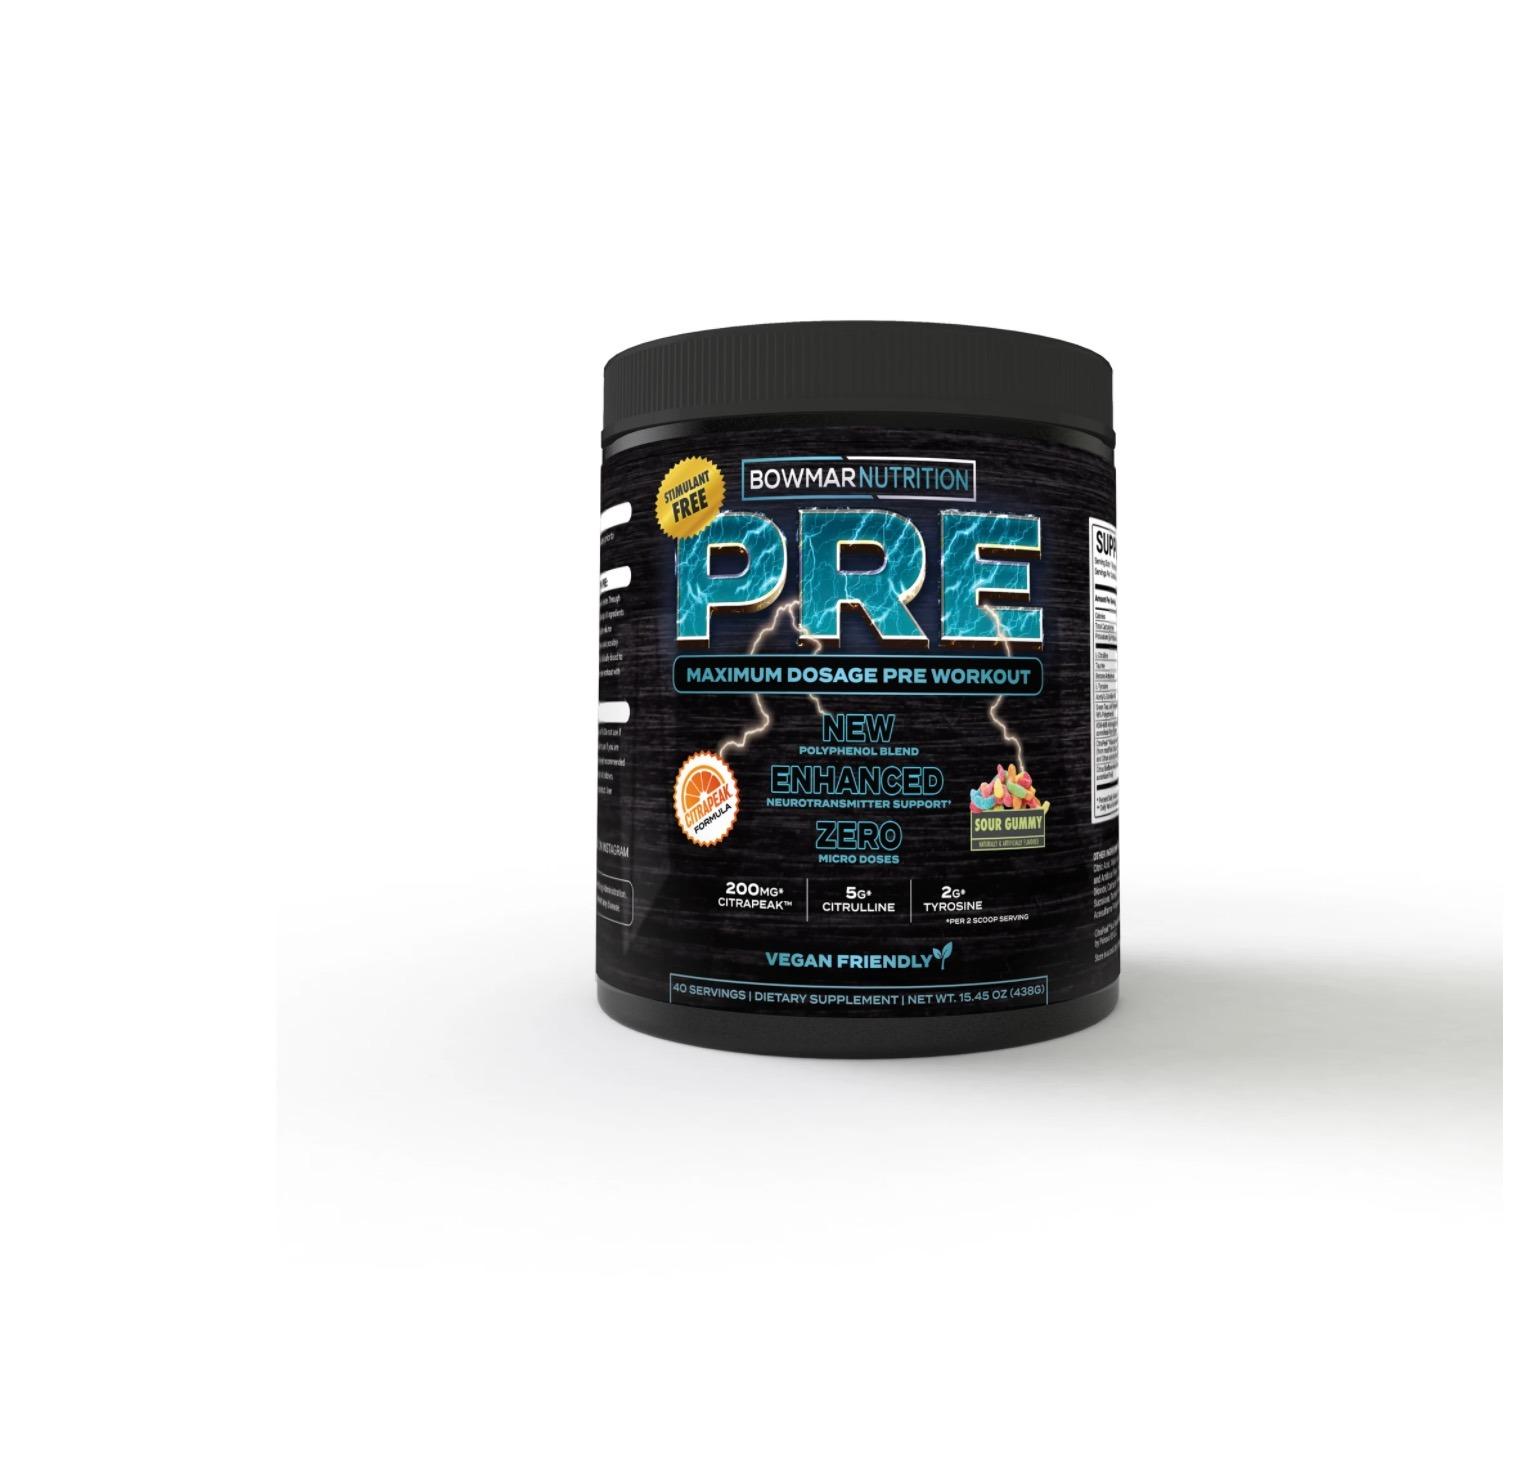 bowmar nutrition pre workout